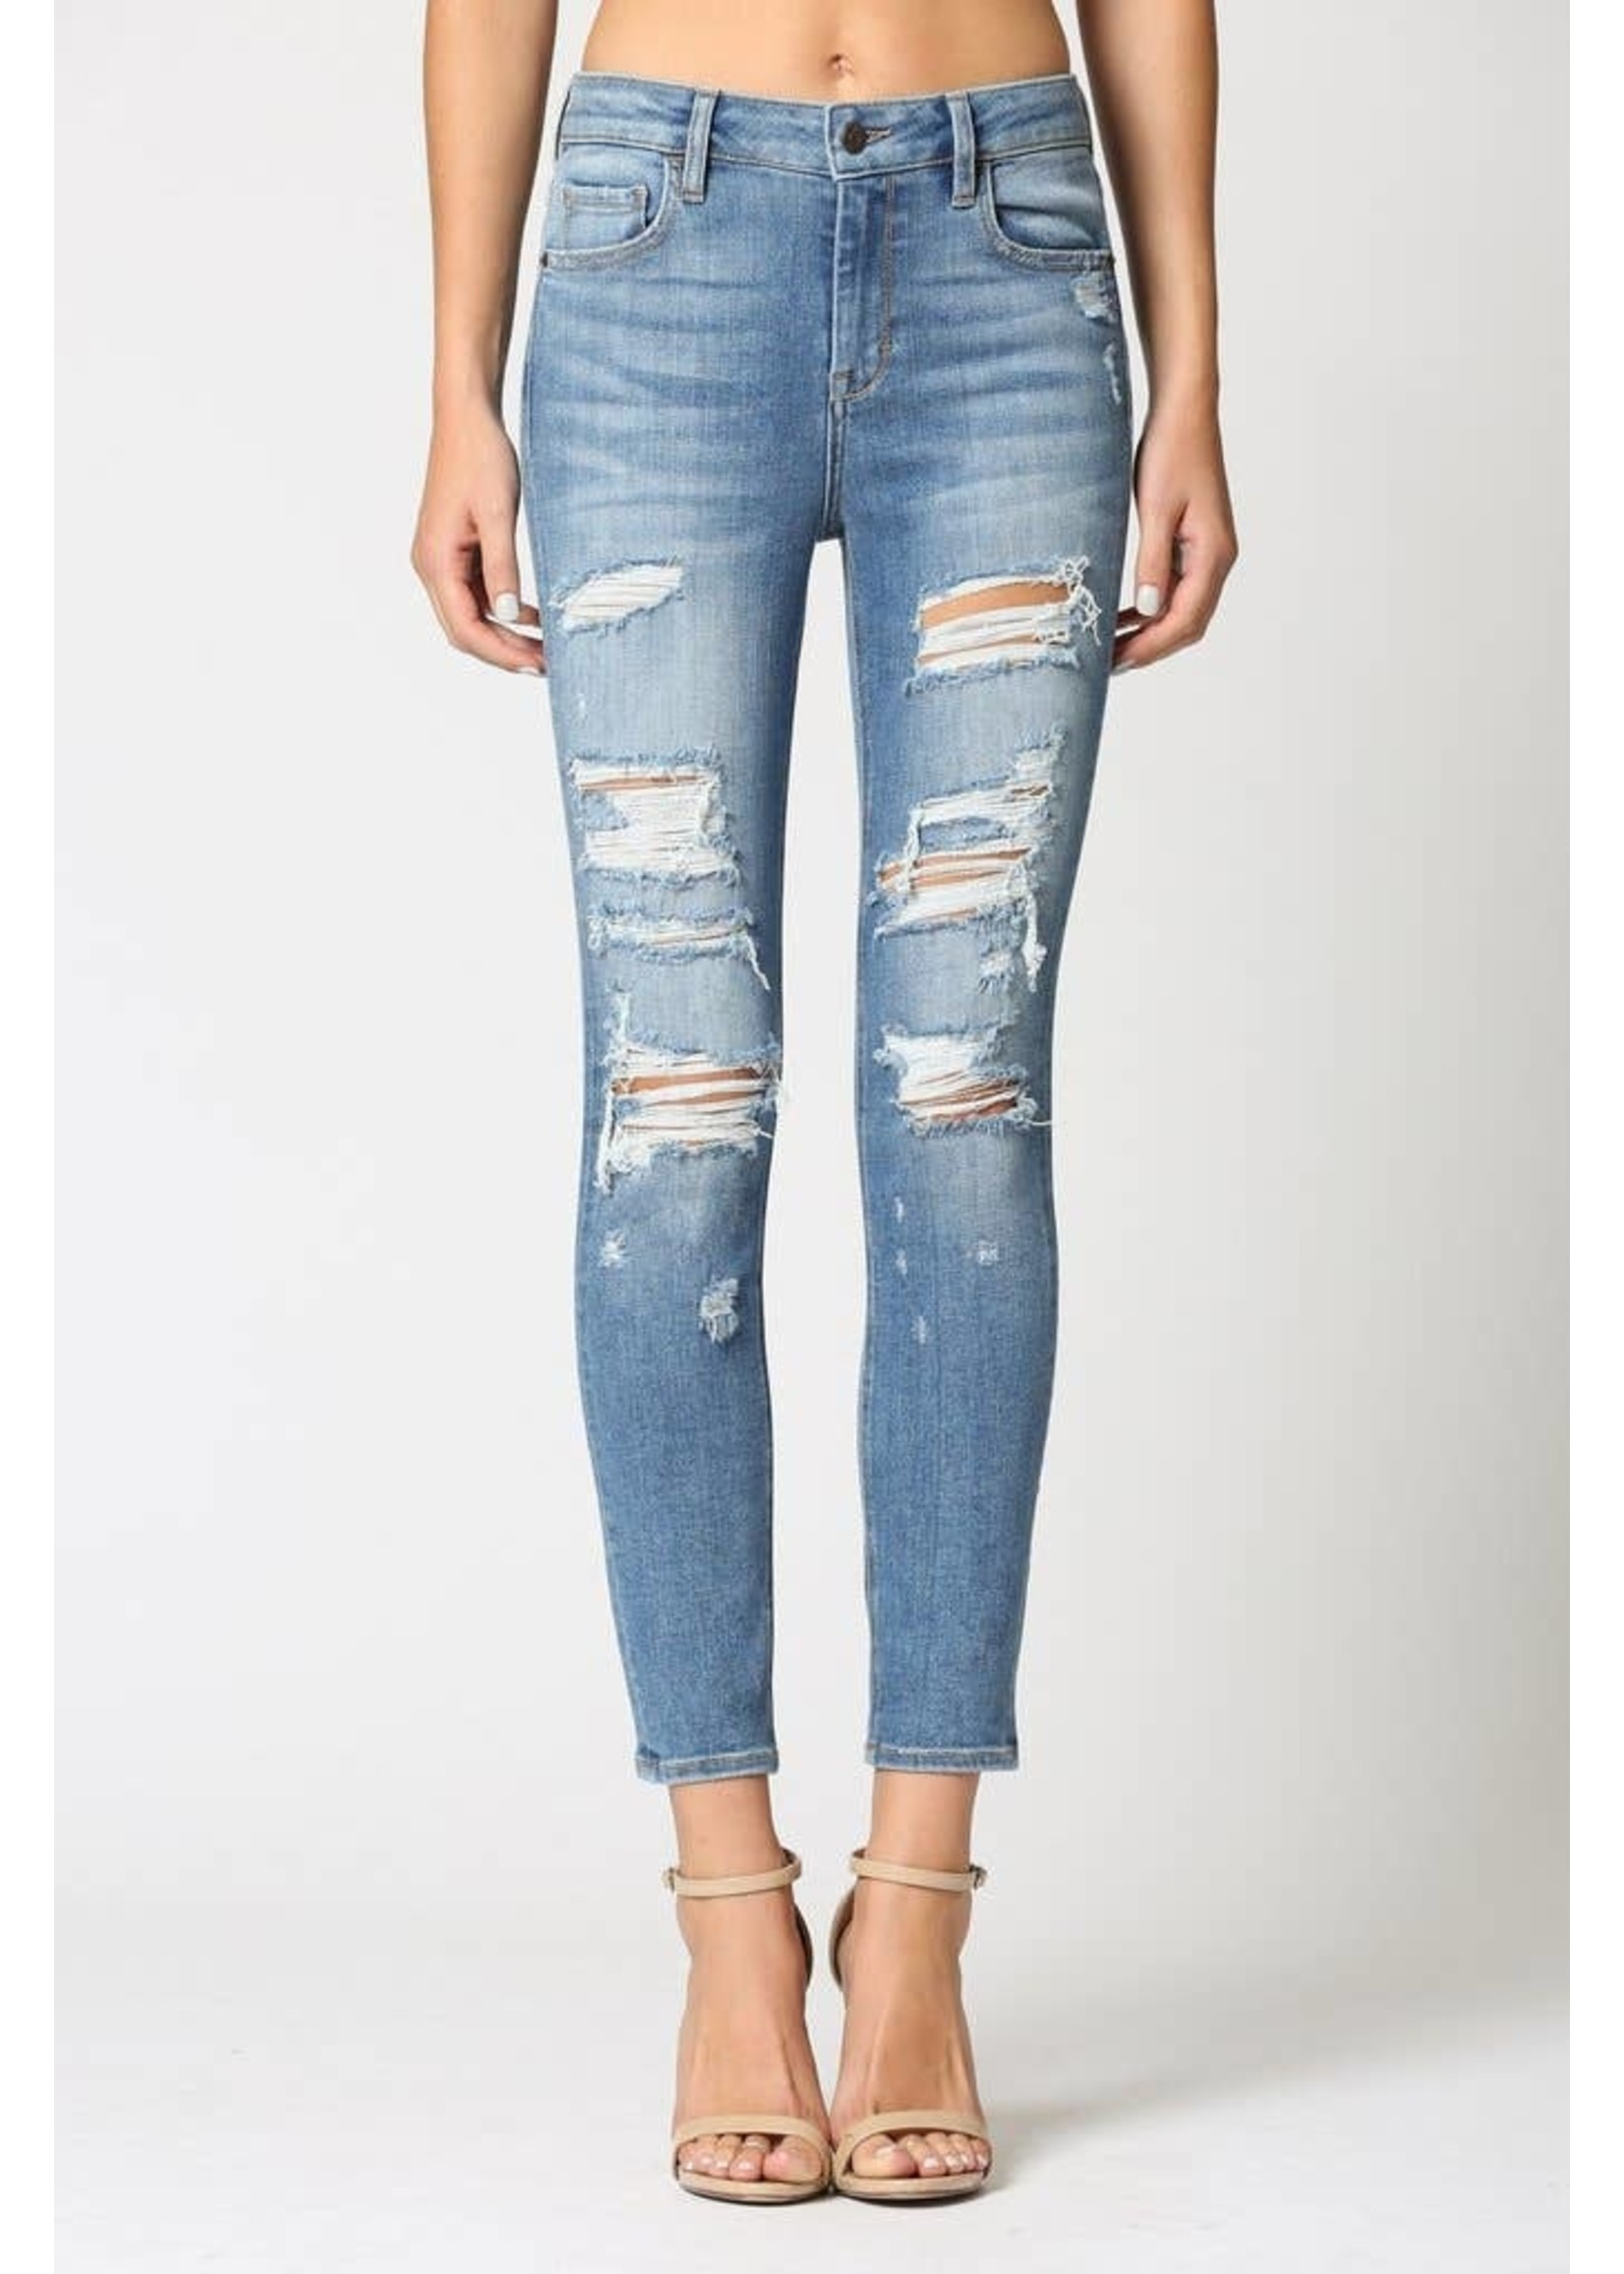 Hidden Jean Amelia-distressed skinny jeans-medium wash